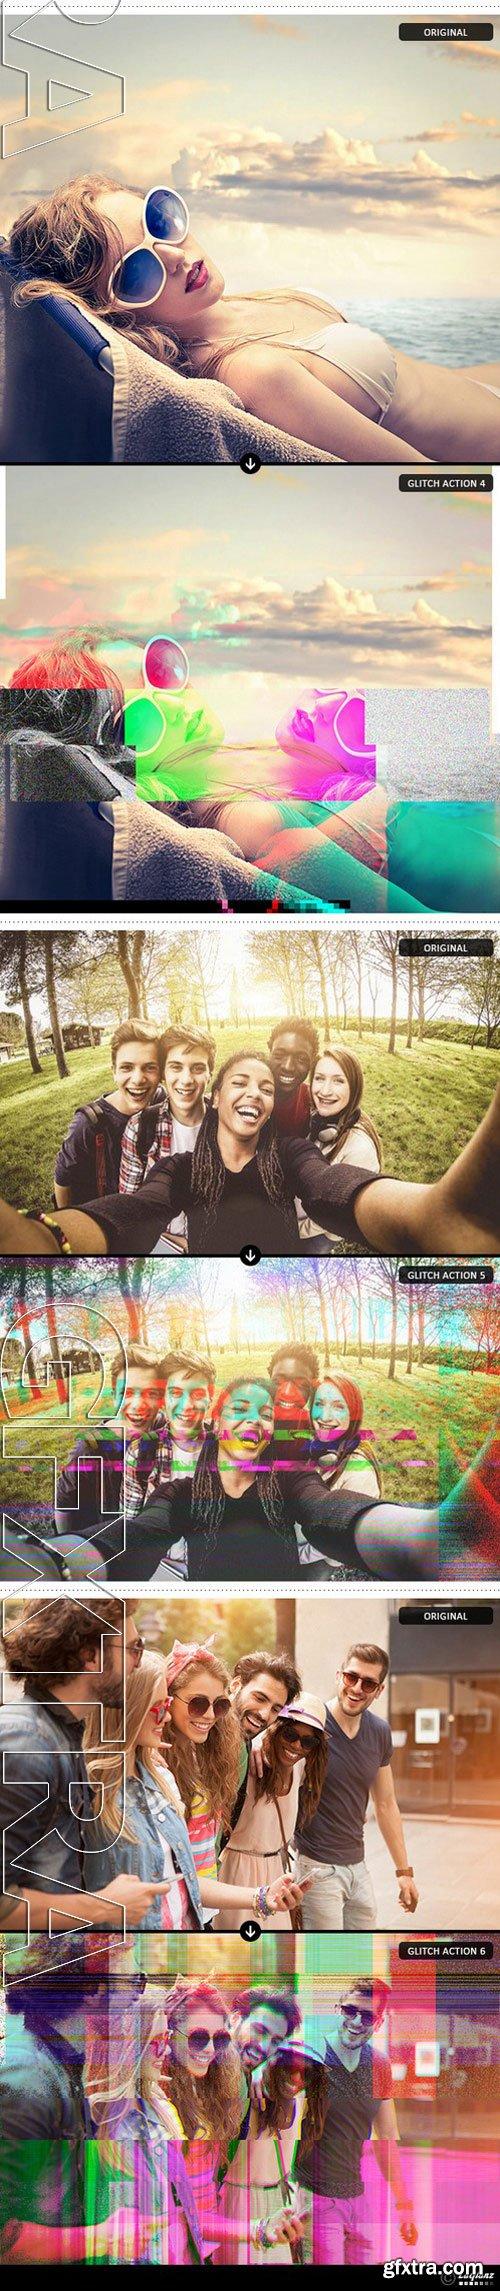 Graphicriver - Glitch Art Photoshop Actions 11455182